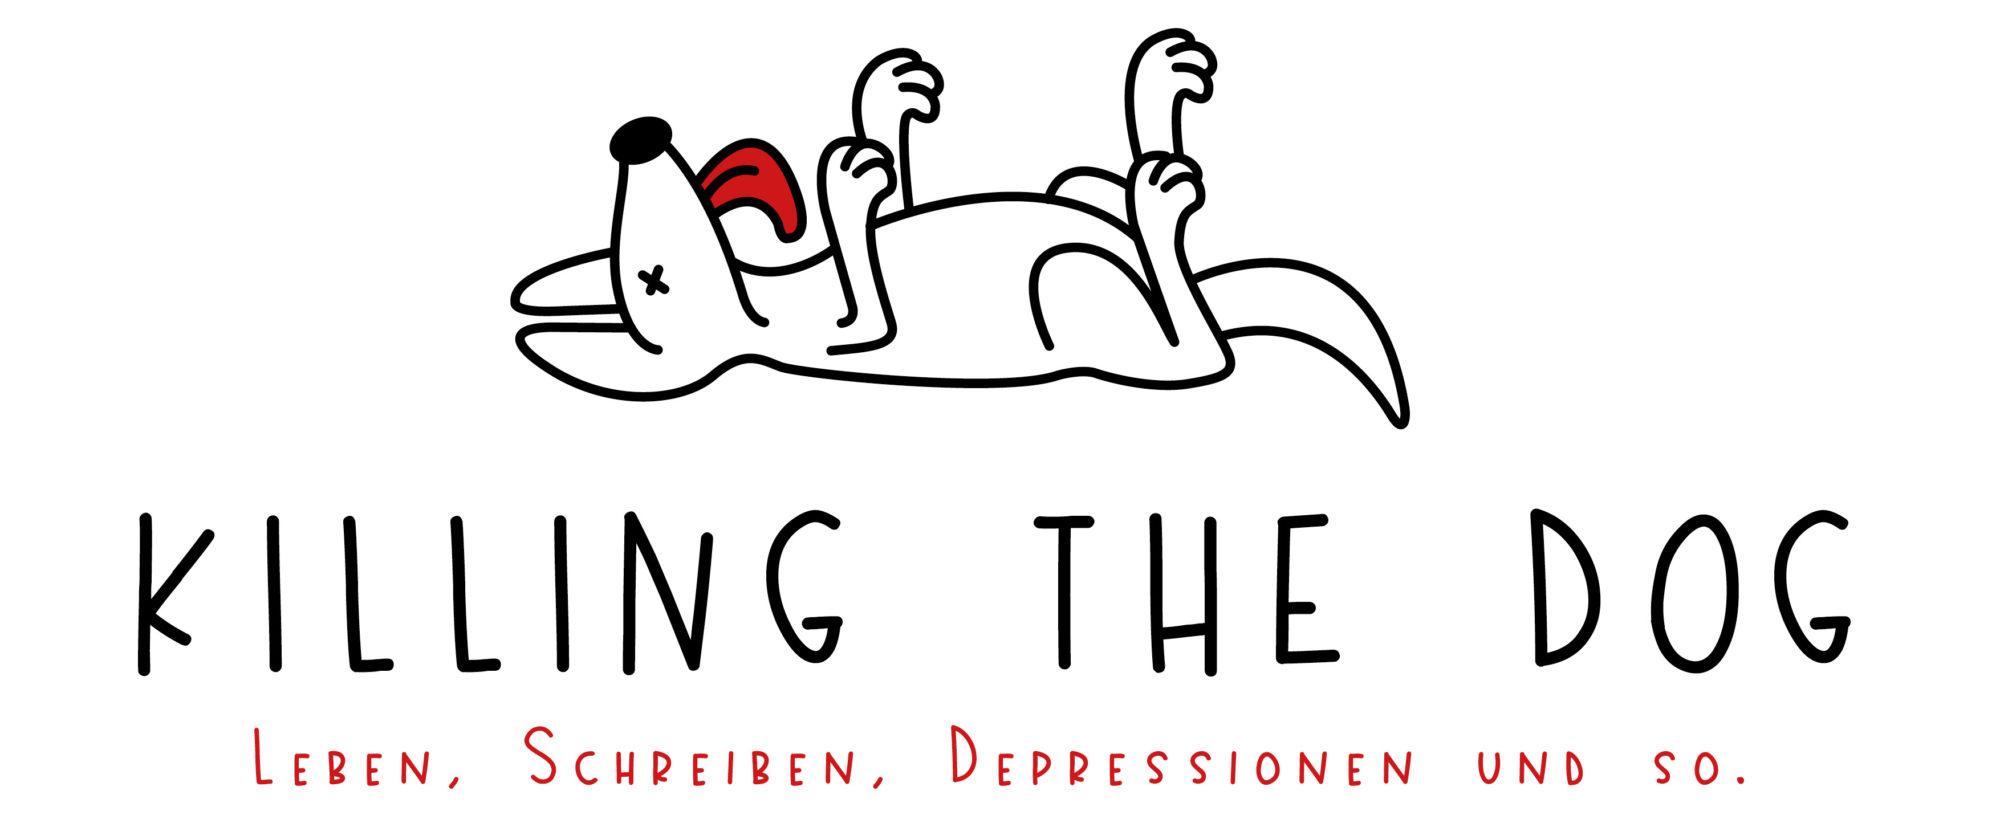 Killing The Dog